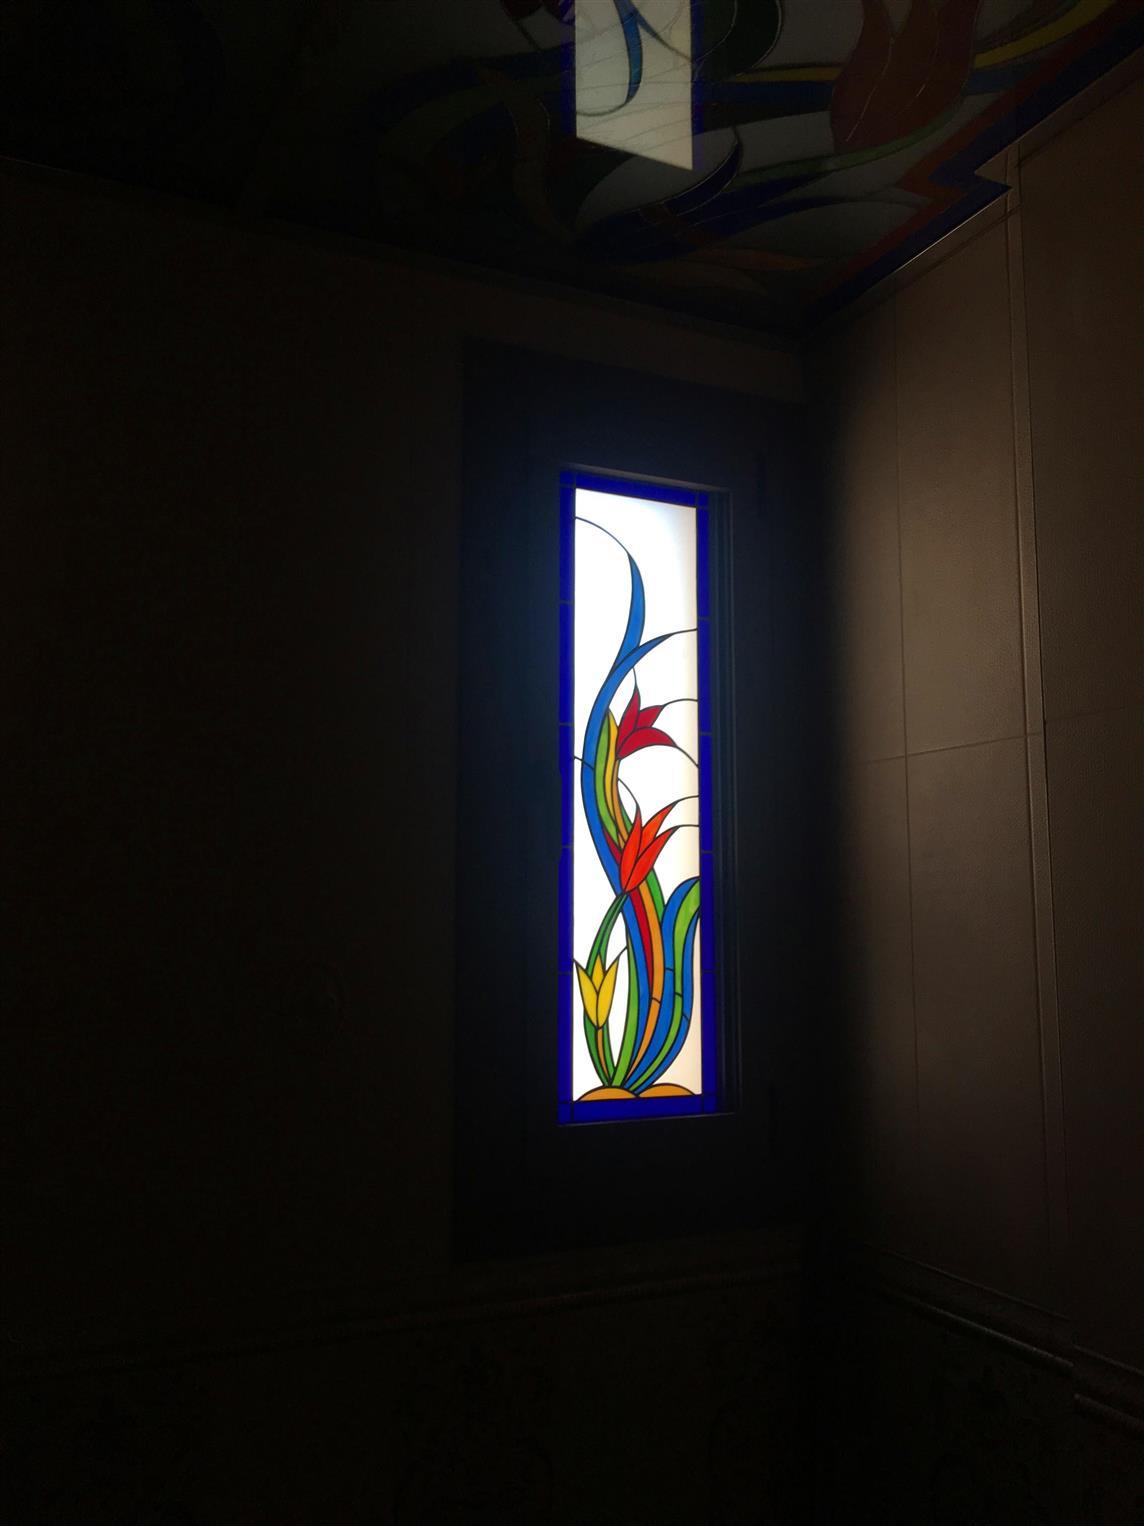 hamam-banyo-tavan-vitraylari20171221185410808.jpg izmir vitray çalışması